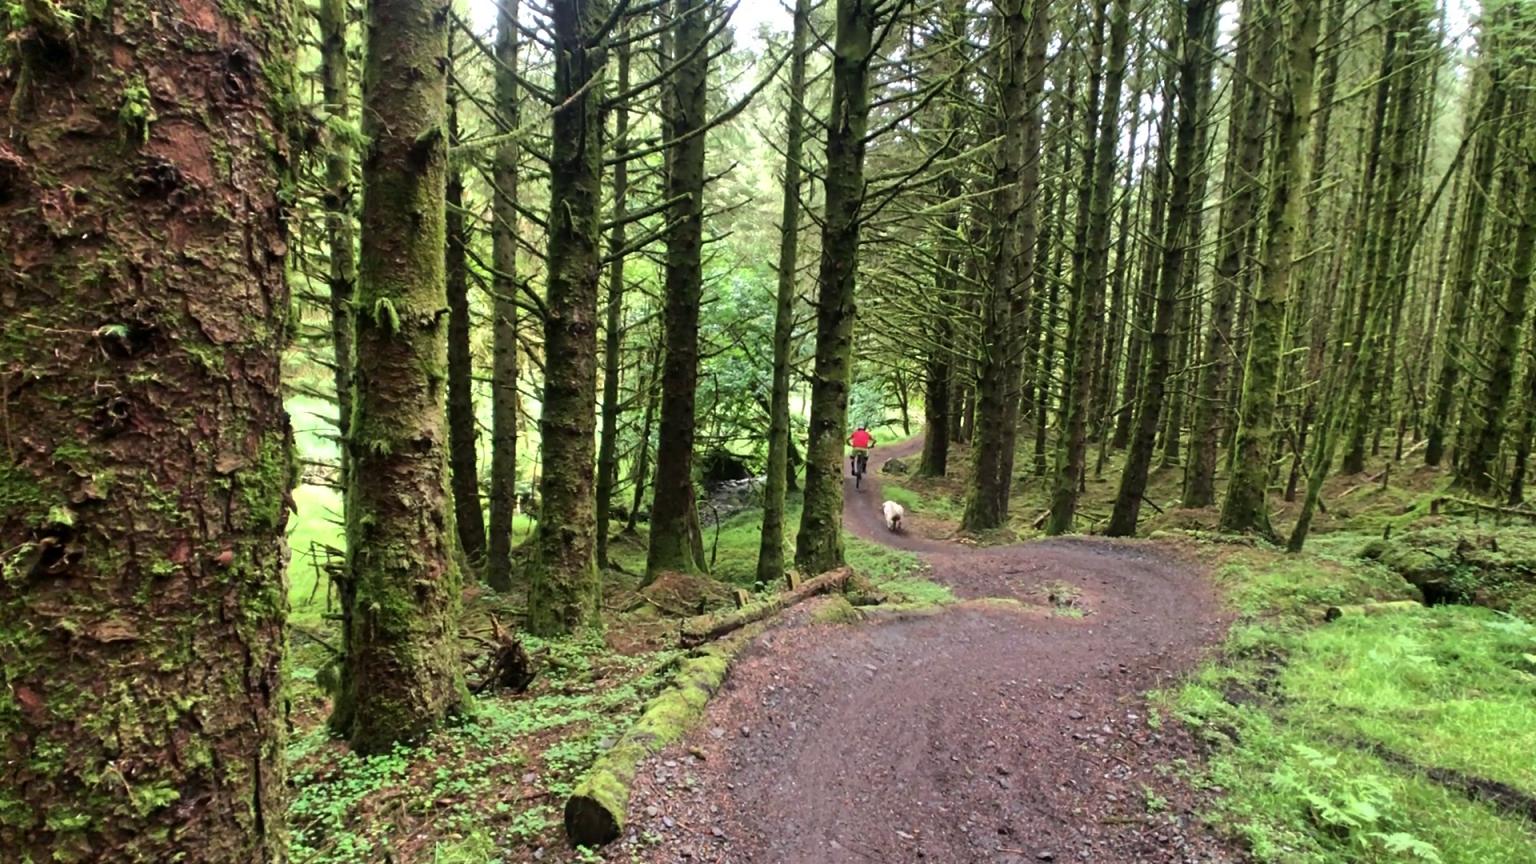 ni_explorer_davagh_forest_mountain_biking_northern_ireland (7).jpg